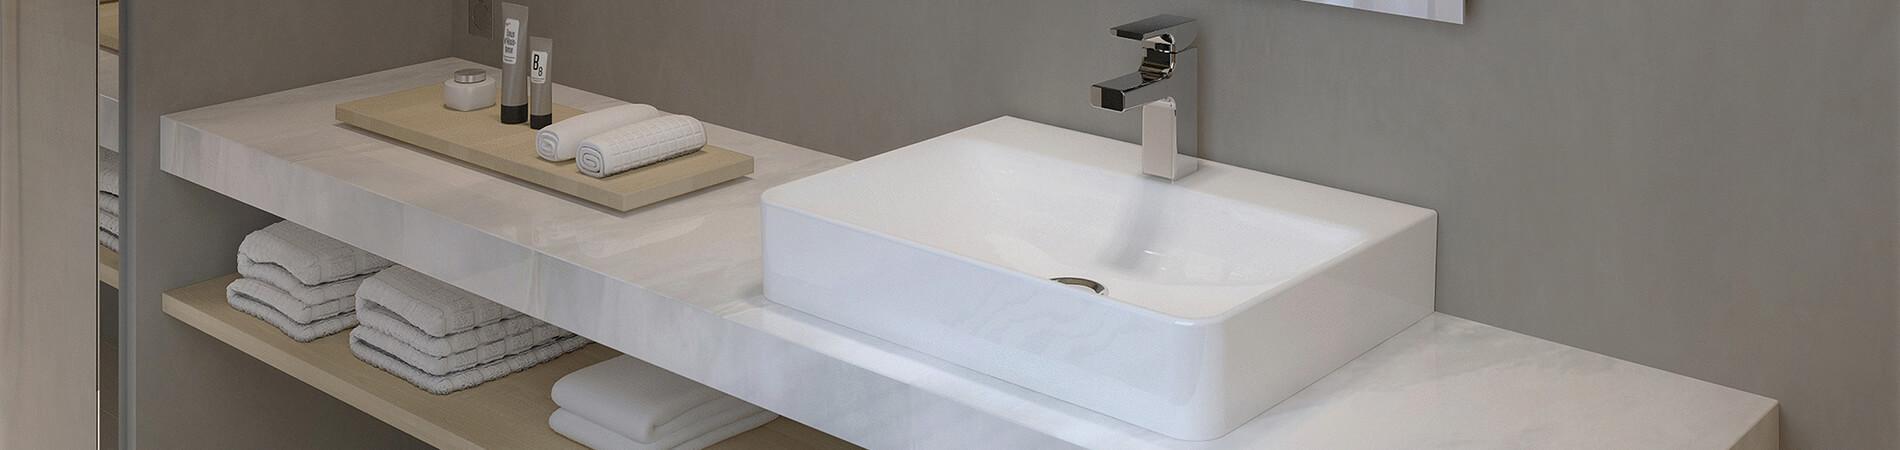 installer salle de bain top conseils en clairage pour une salle de bain with installer salle de. Black Bedroom Furniture Sets. Home Design Ideas